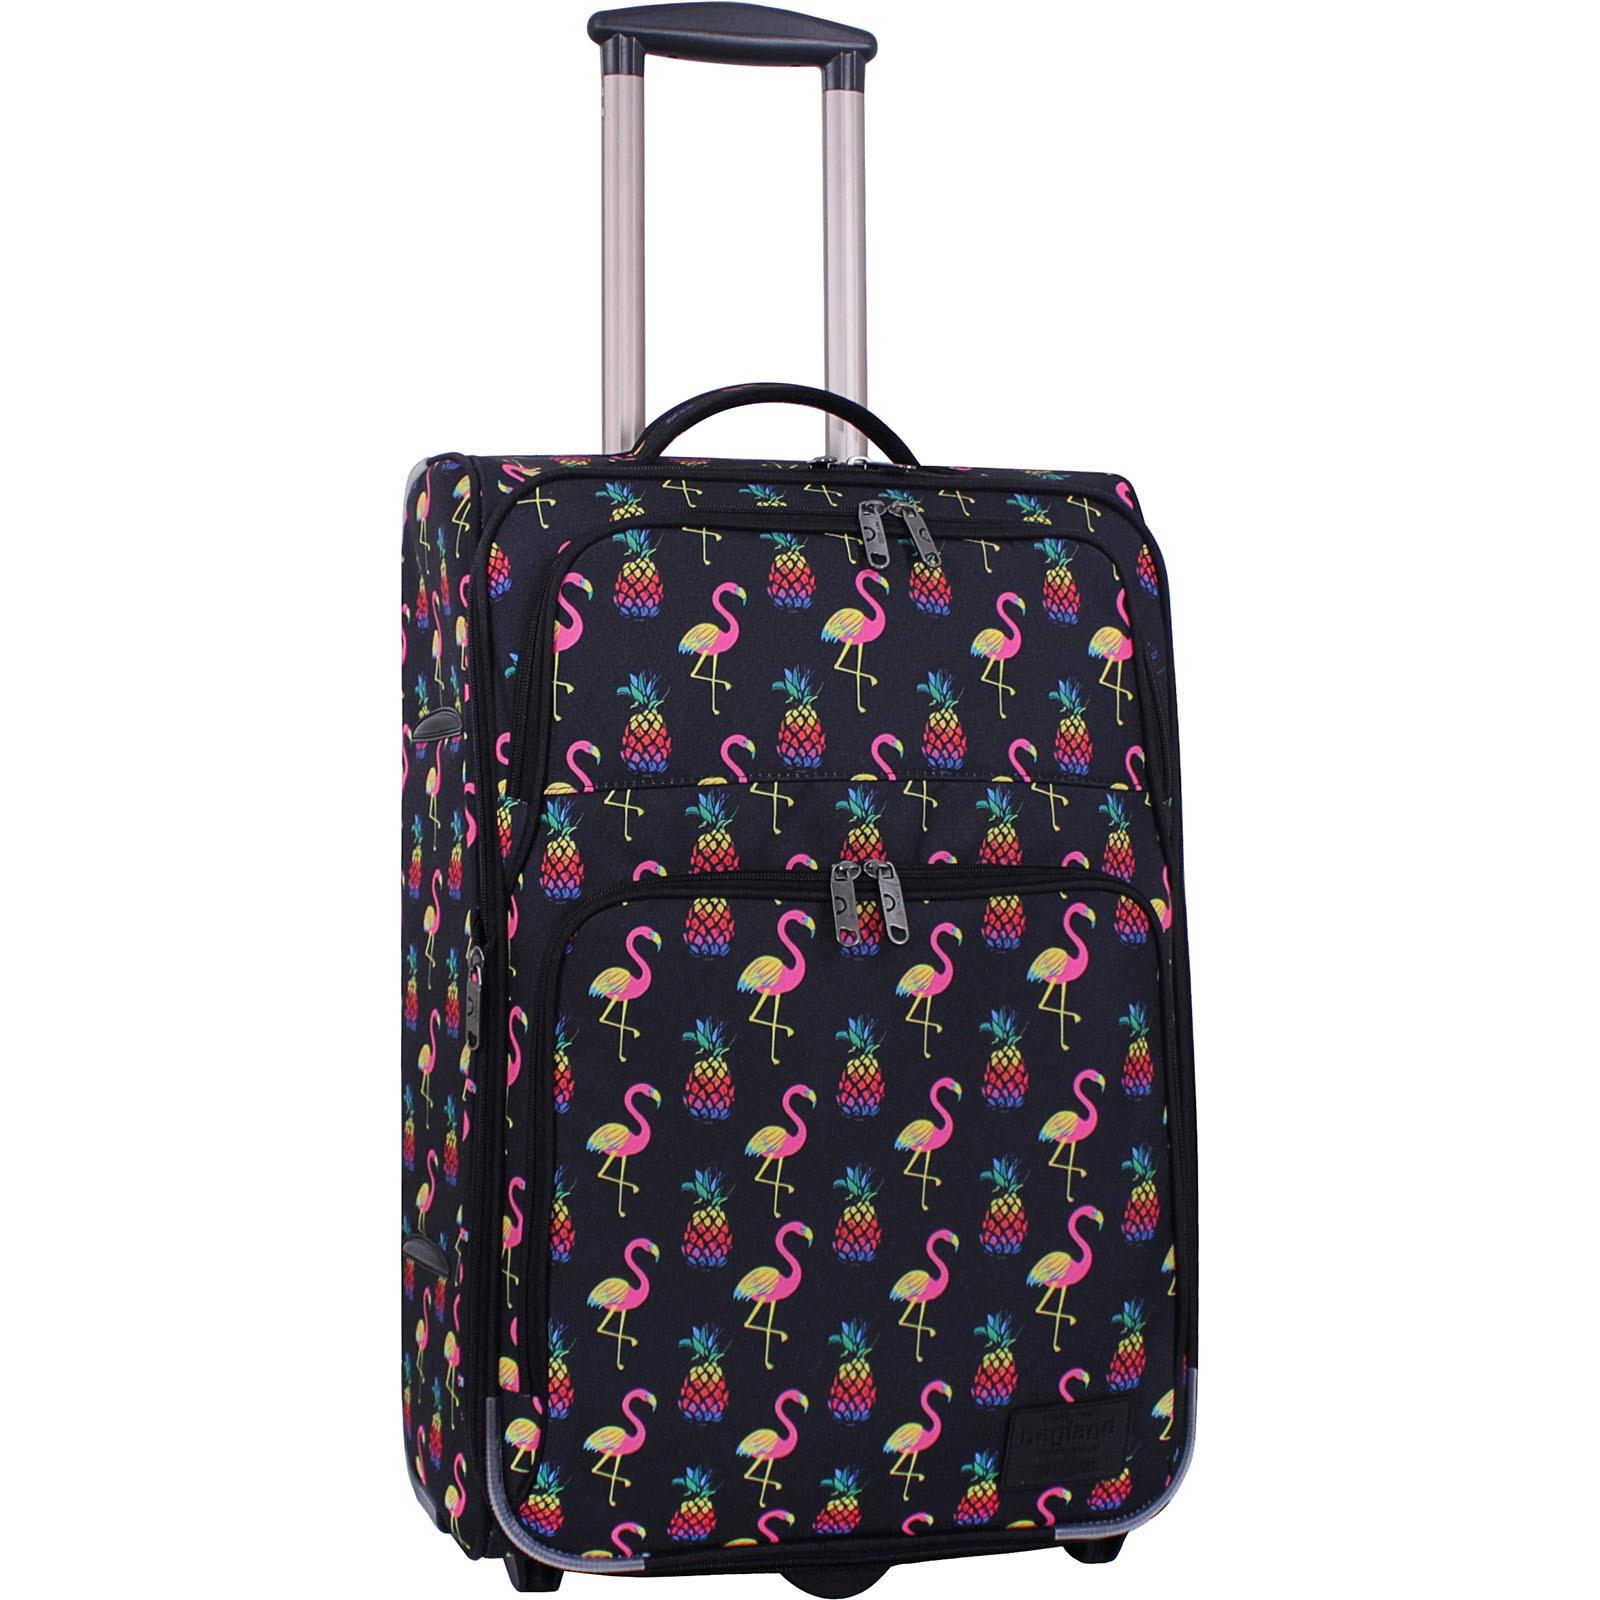 Дорожные чемоданы Чемодан Bagland Леон средний дизайн 51 л. сублімація 361 (0037666244) IMG_2769_суб.361_.JPG